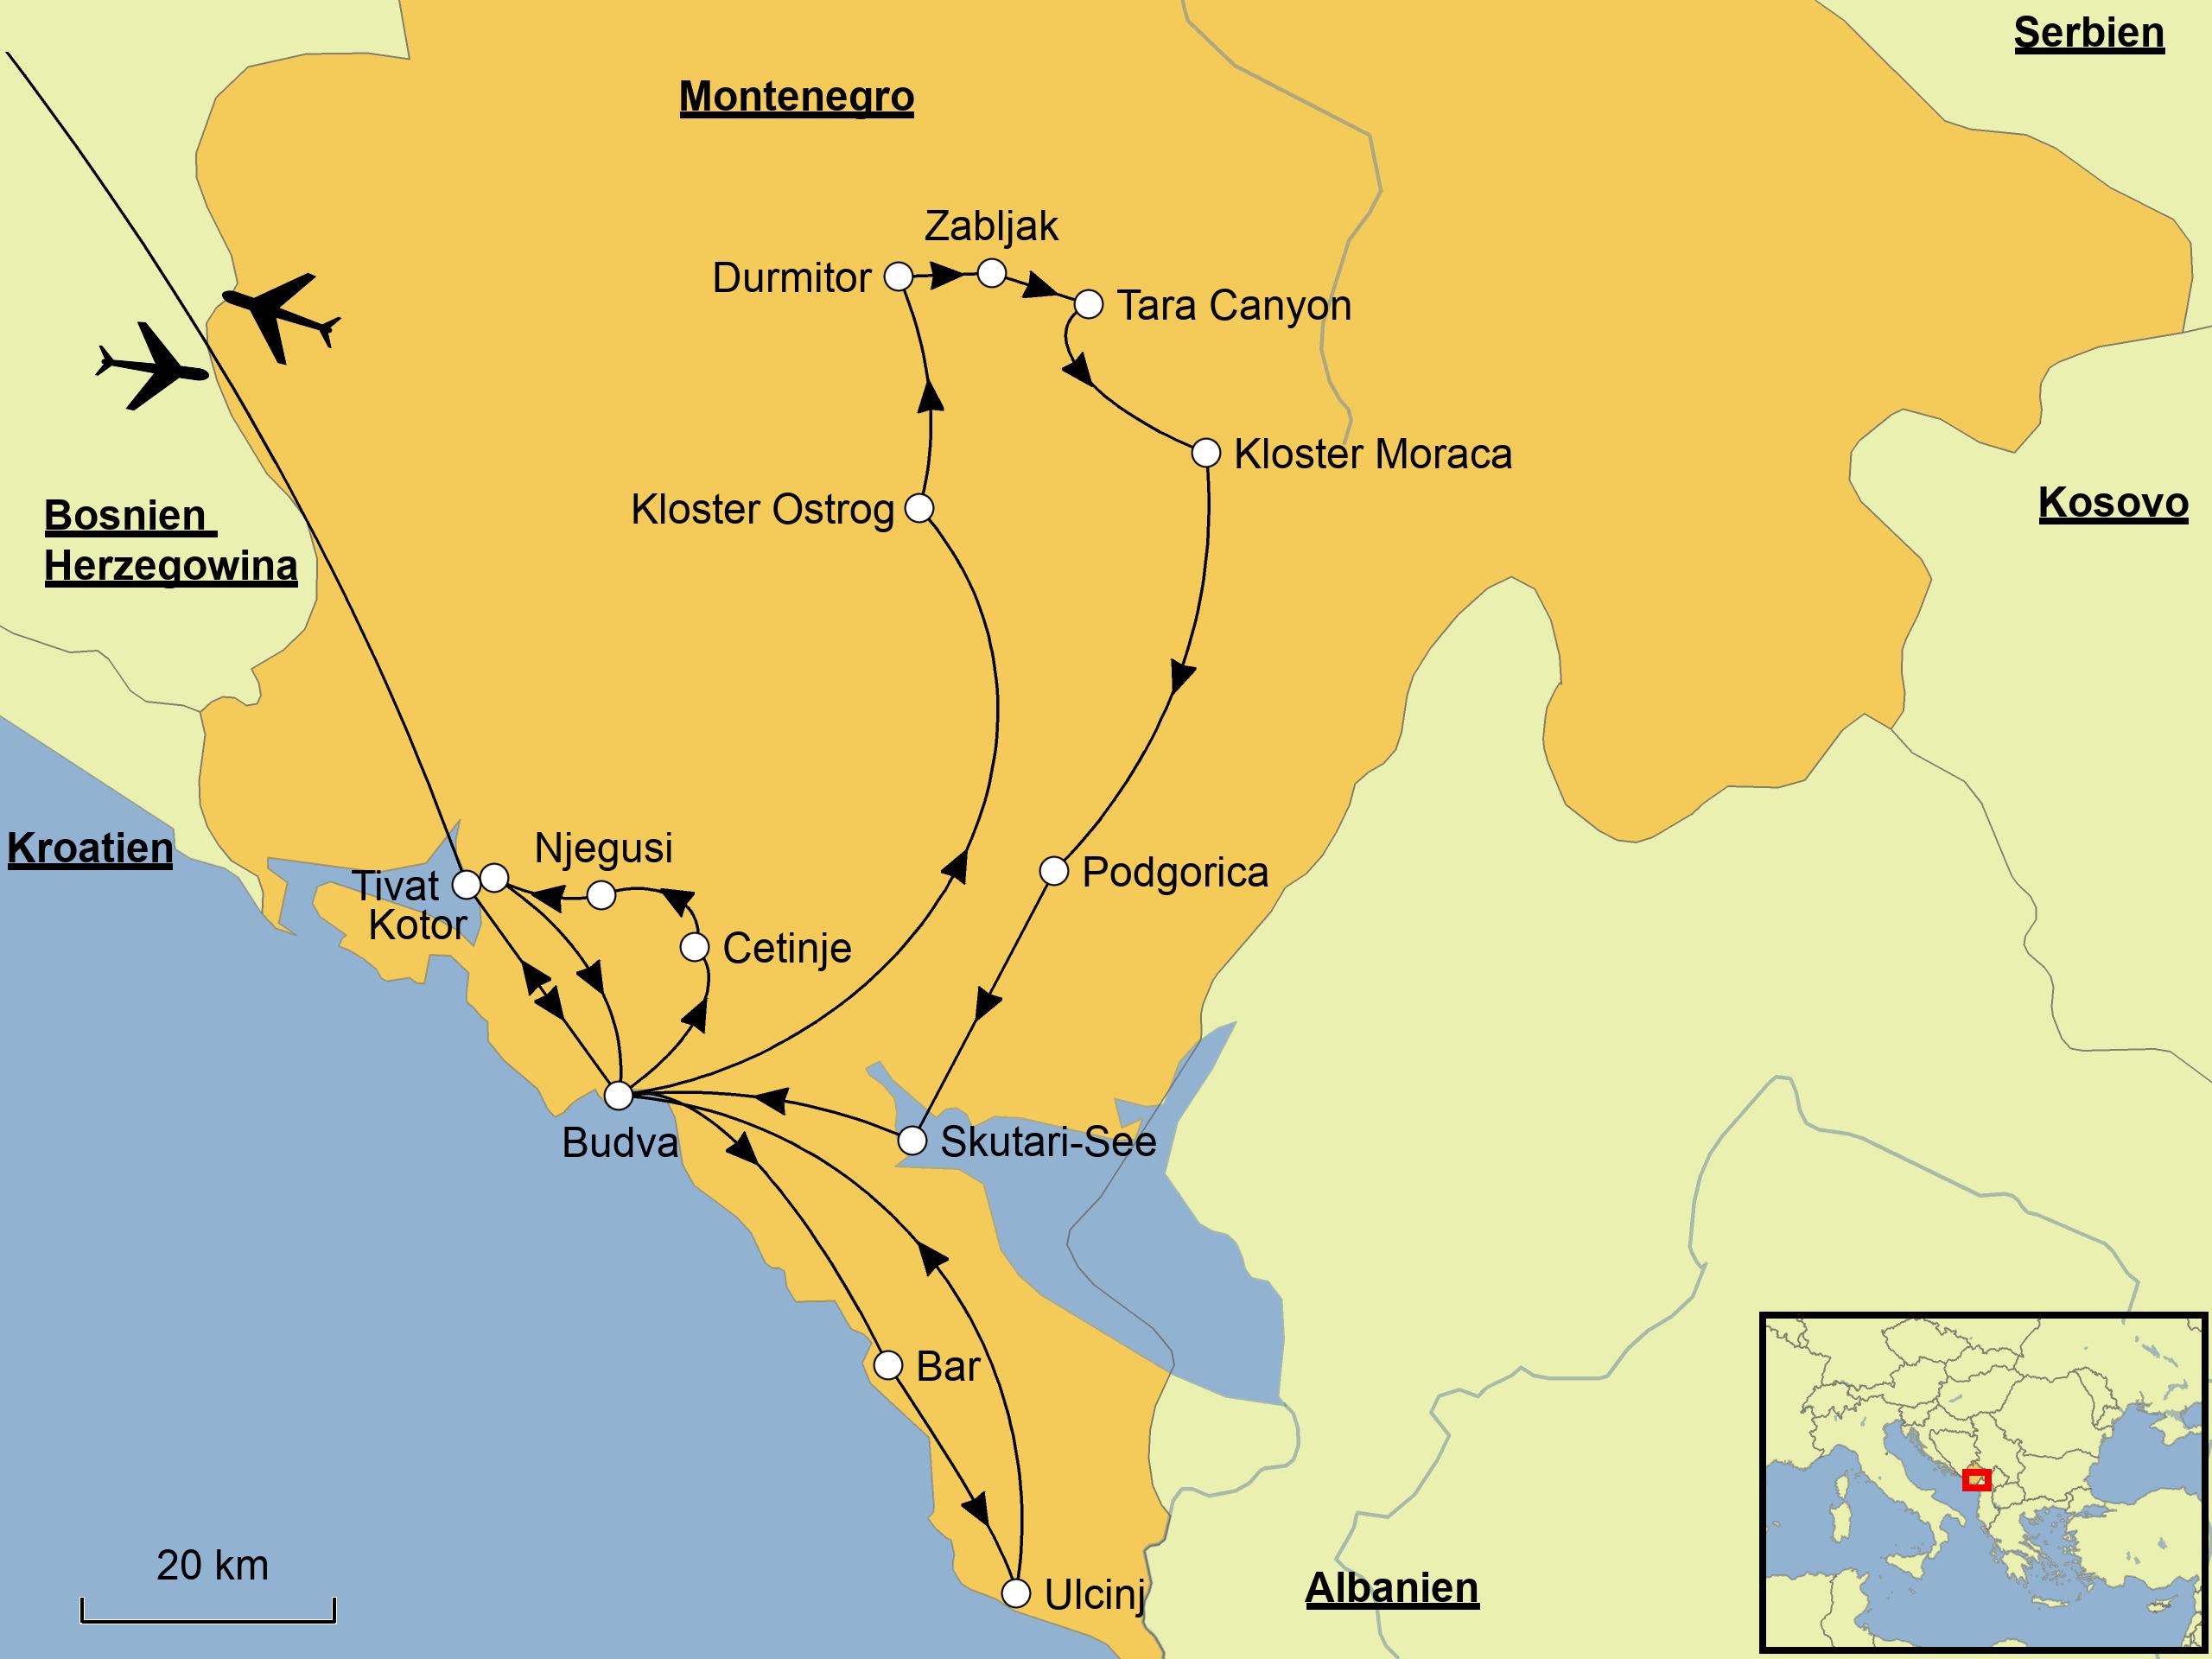 Kotor Montenegro Karte.Montenegro Srd Reisen